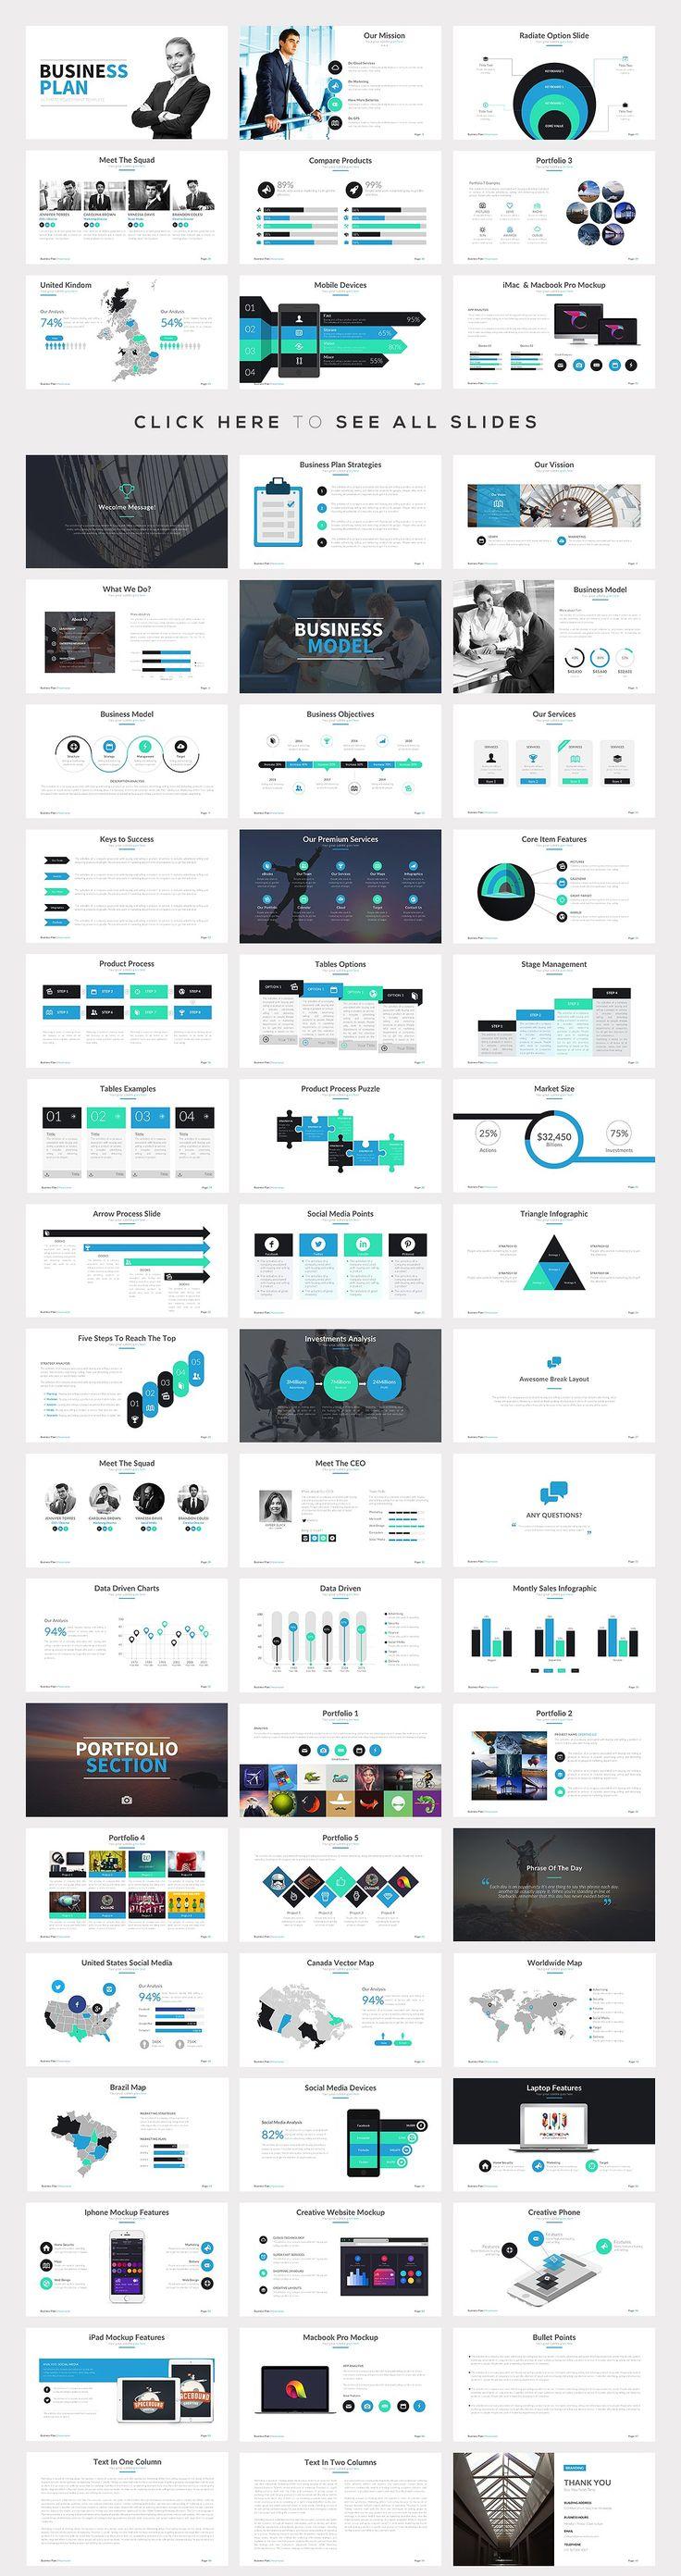 Best PowerPoint Templates Bundle by SlidePro on @creativemarket